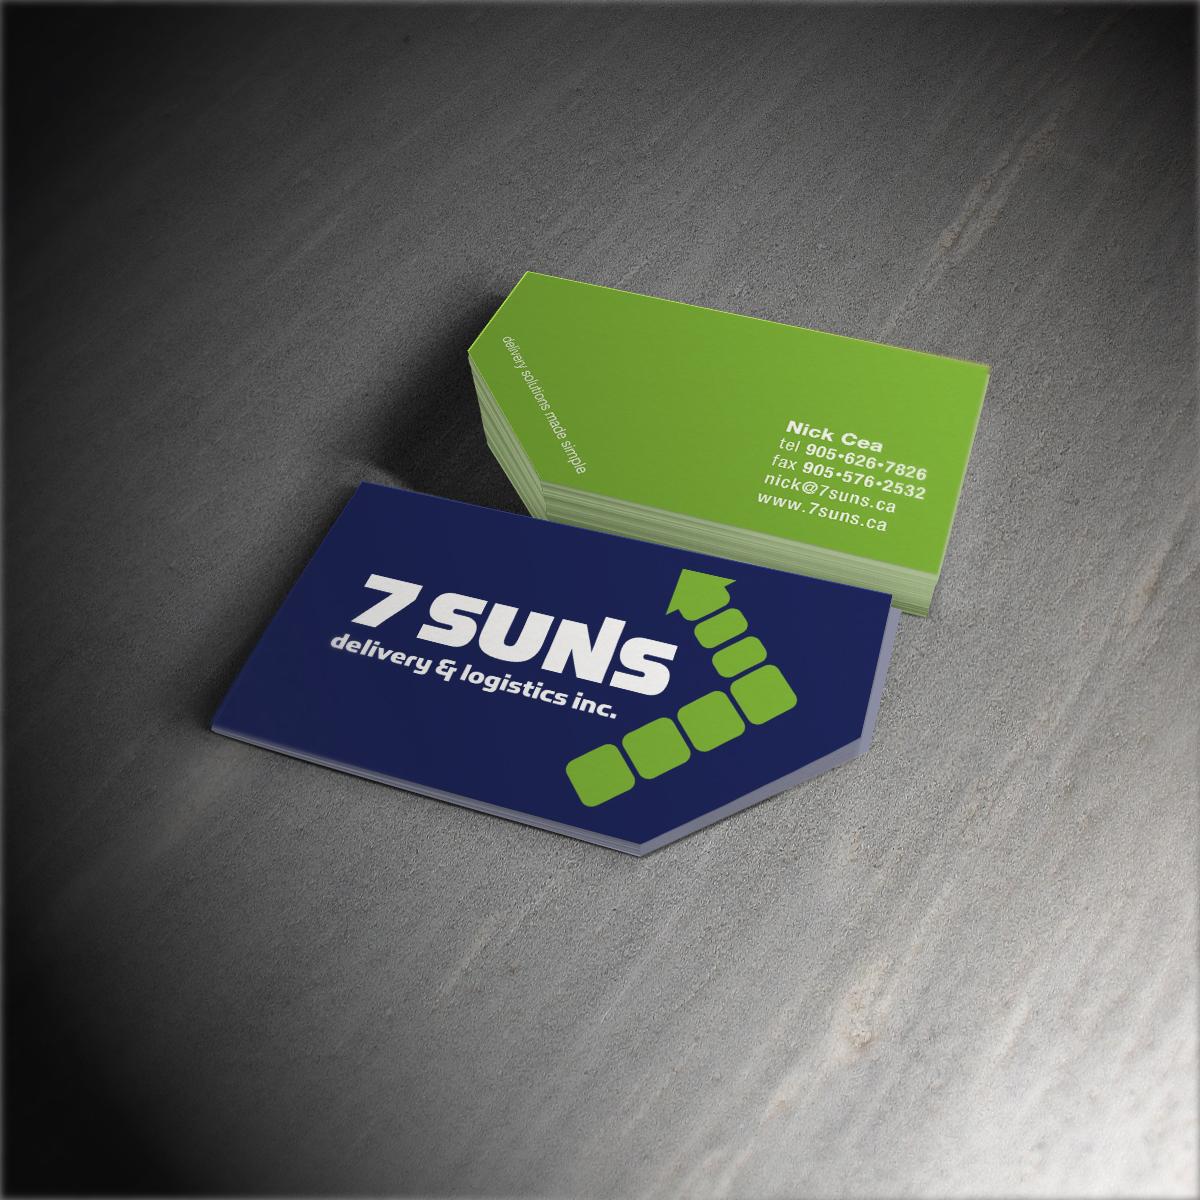 7 Suns - Cards